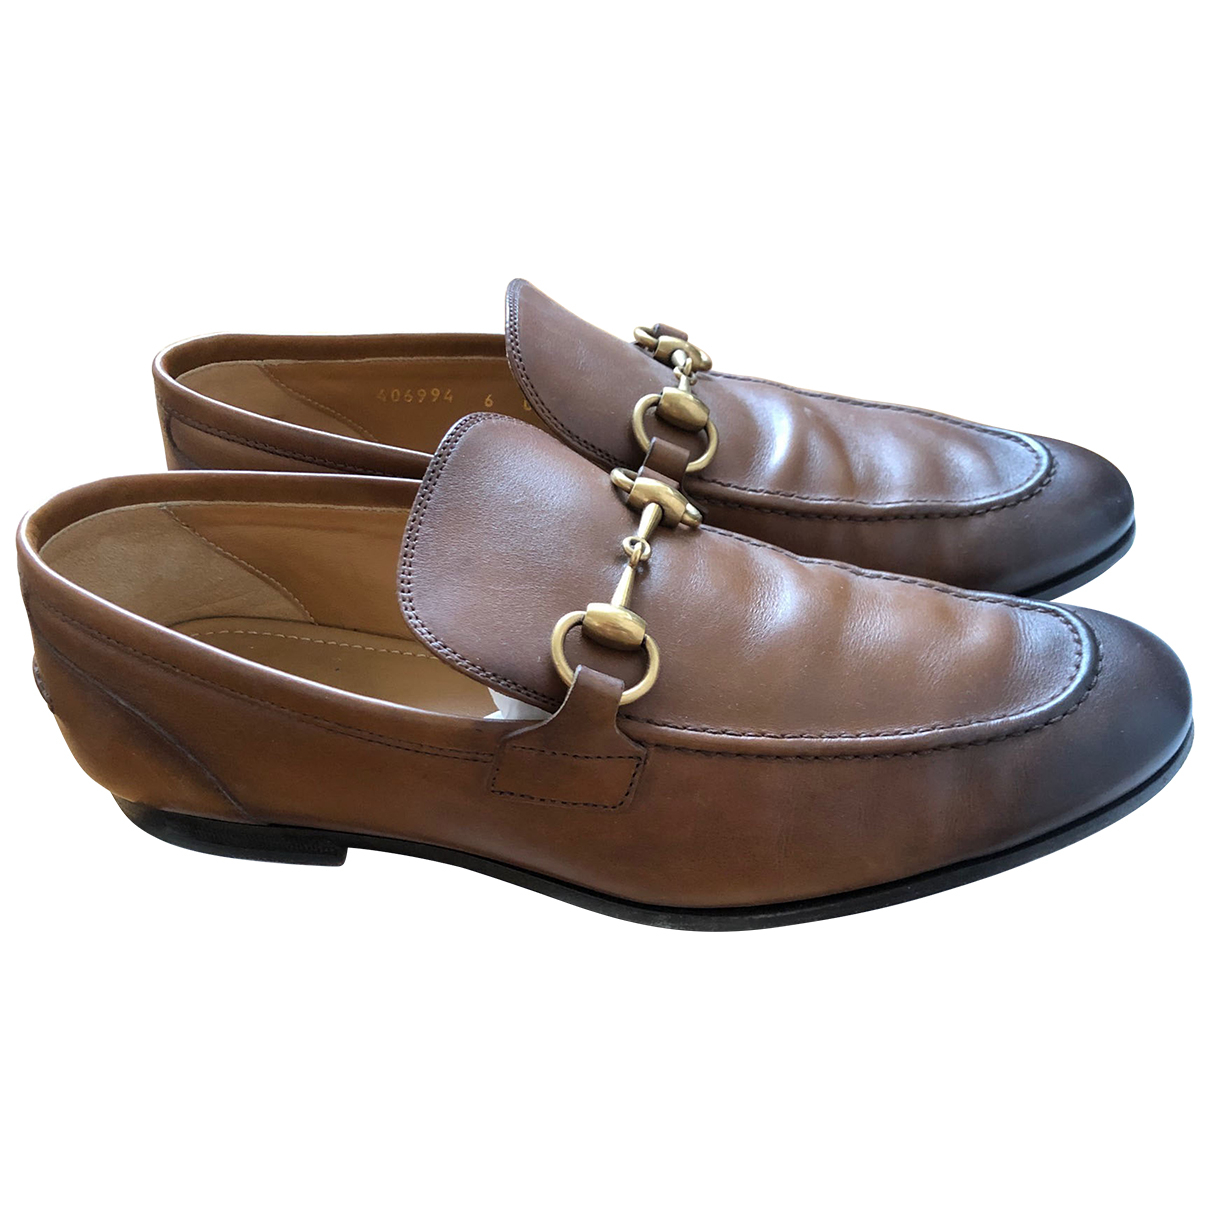 Gucci - Mocassins Jordaan pour homme en cuir - marron